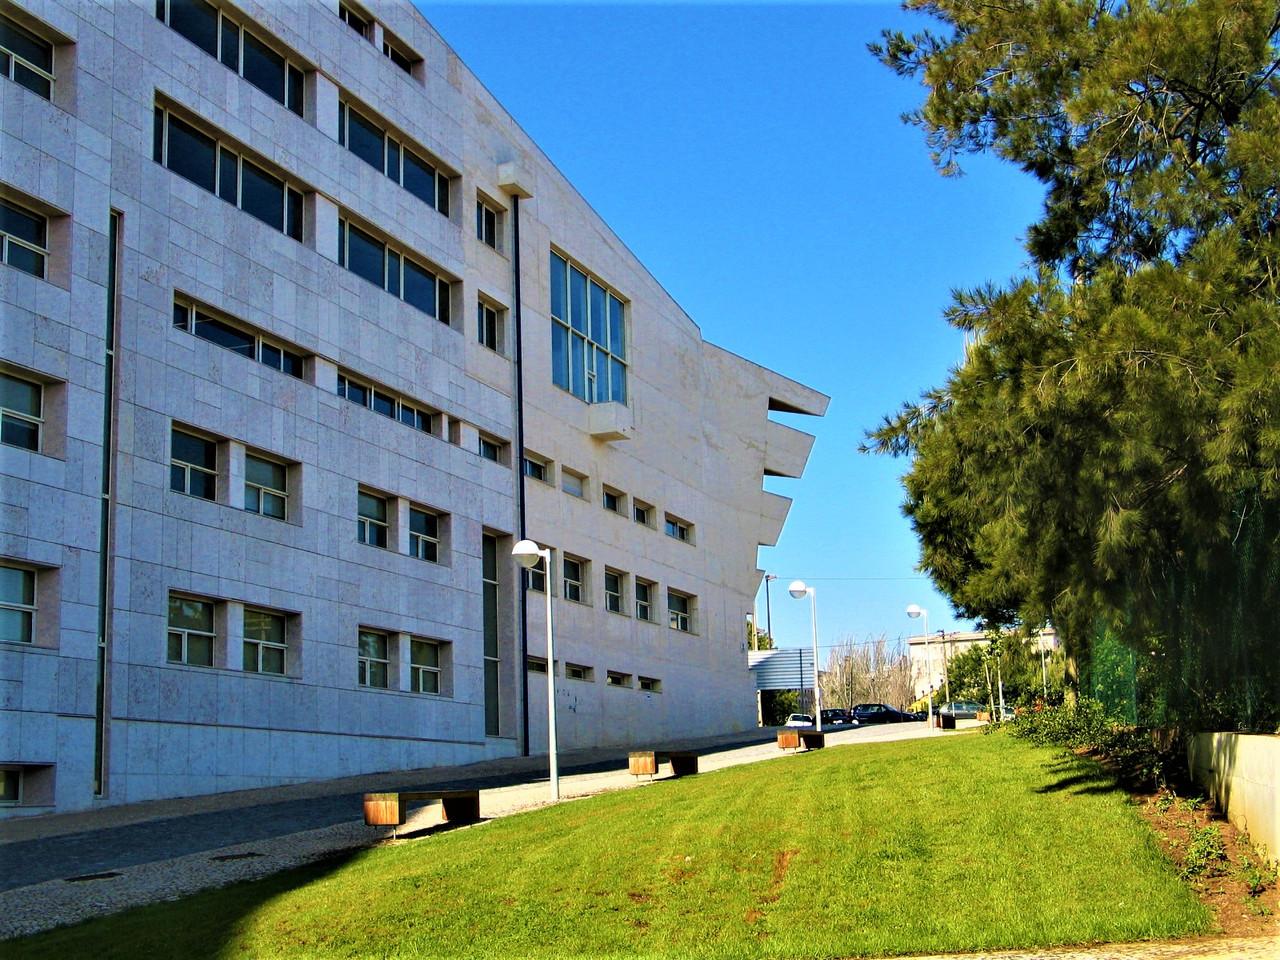 Iscte-Instituto Universitário de Lisboa